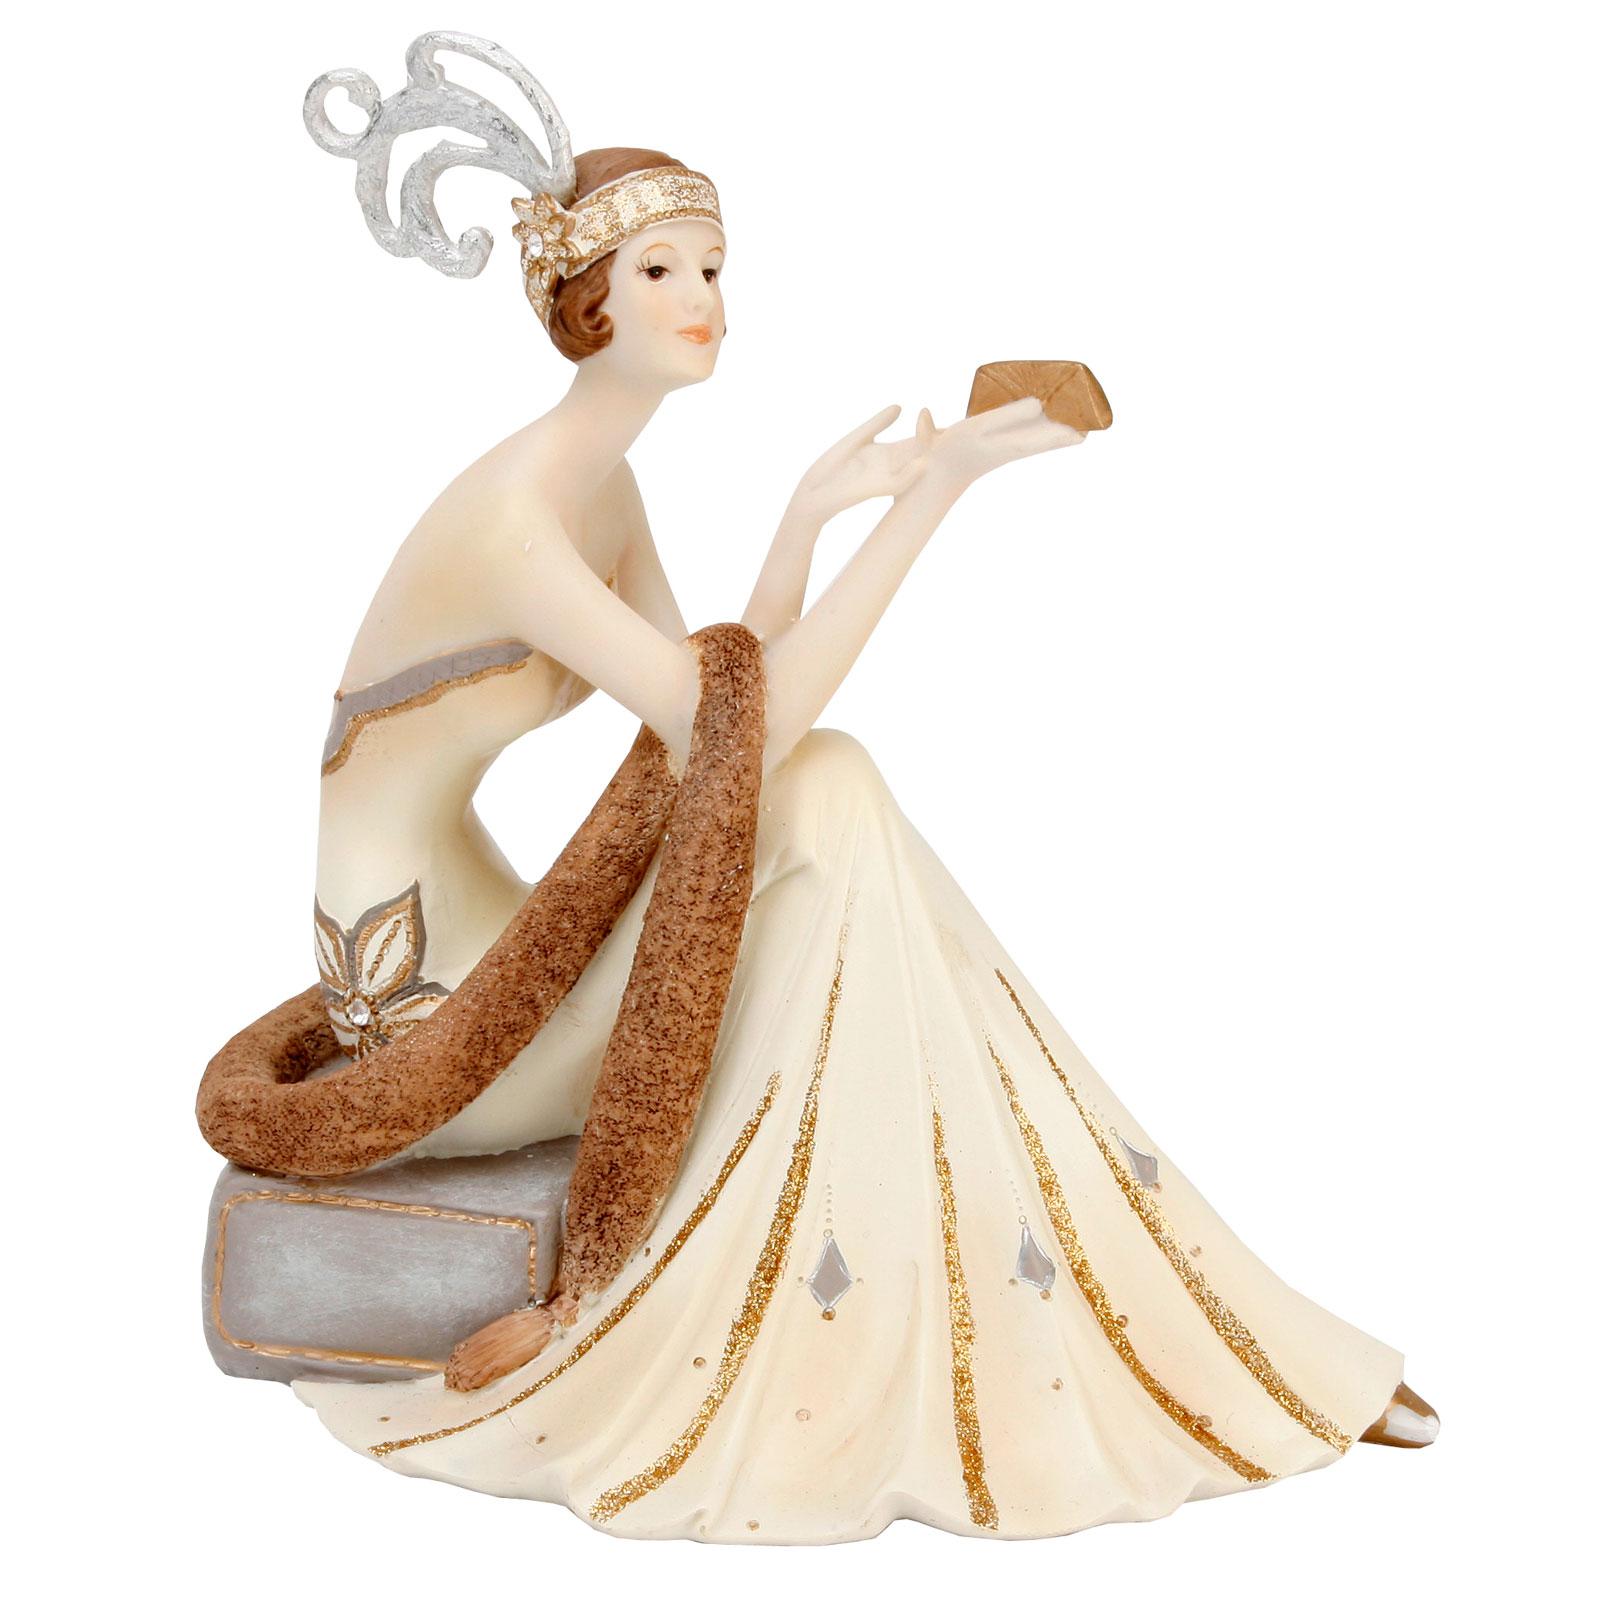 juliana art deco chicago style evening model lady figurine gift ornament statue ebay. Black Bedroom Furniture Sets. Home Design Ideas